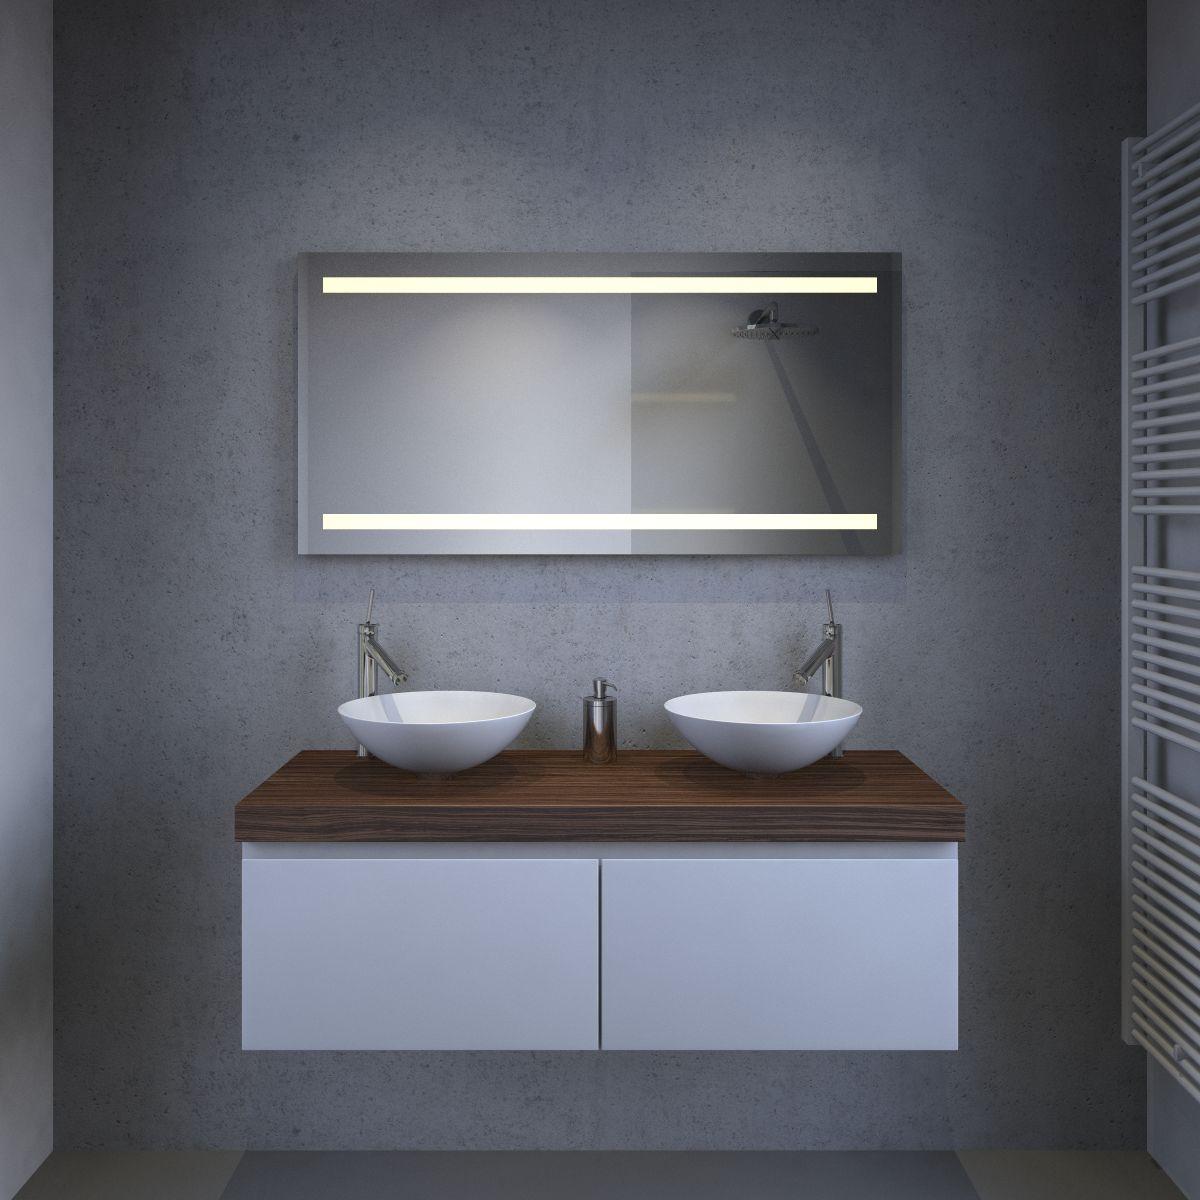 Afmeting Badkamer Spiegel ~  Spiegels met verlichting  Spiegels met led verlichting  Badkamer